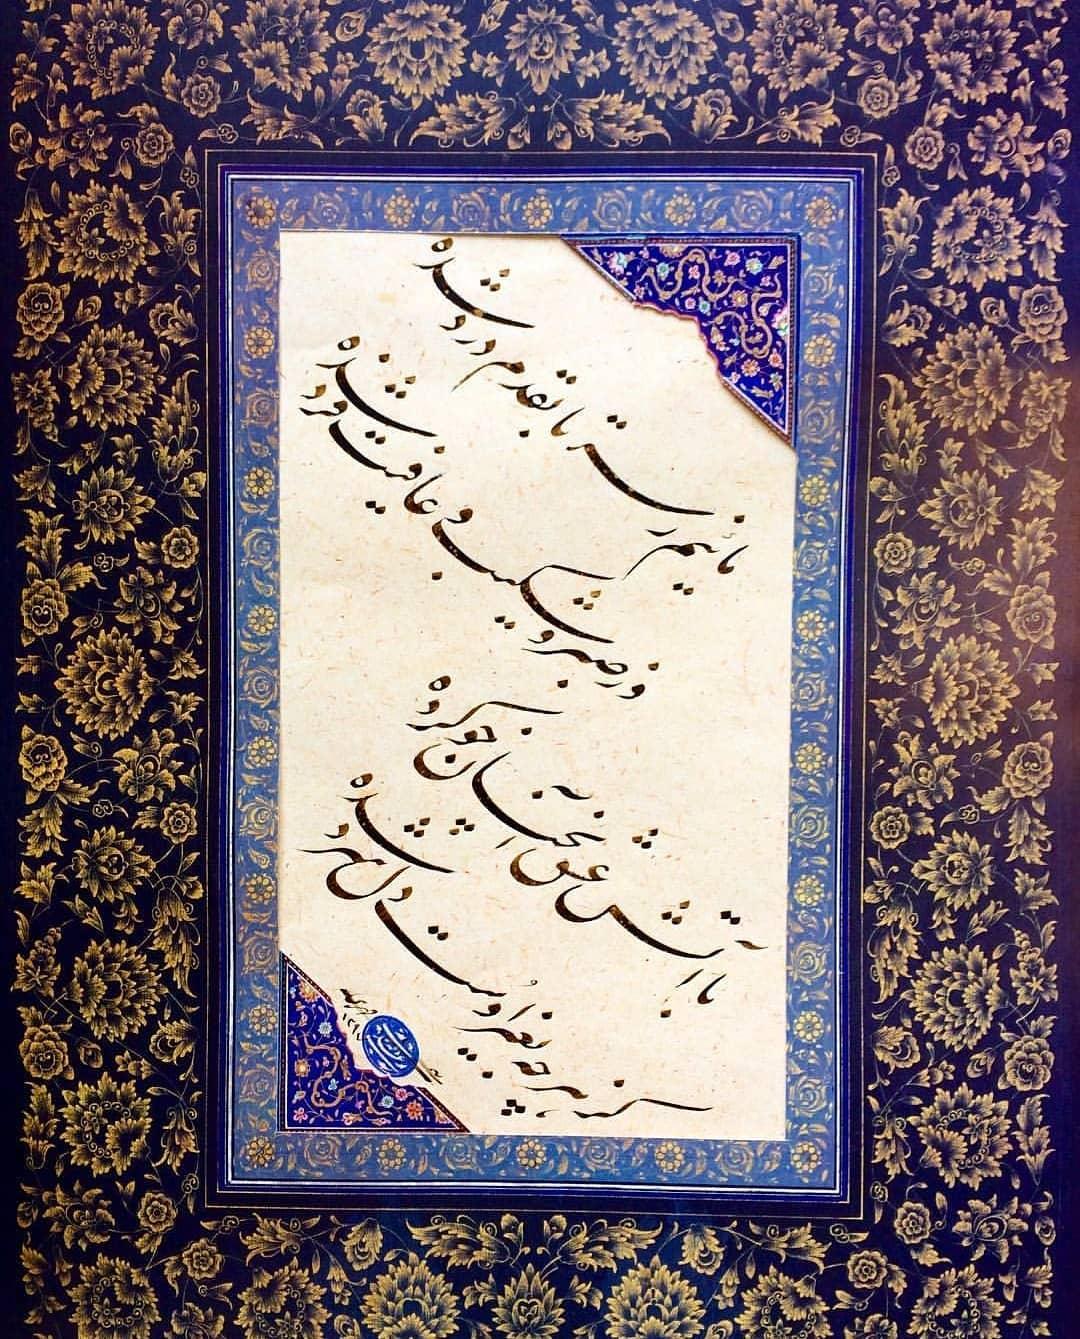 Farisi/Nasta'liq khatestan  ** مائیم زسر تا به قدم درد شده وز صبر و شکیب و عافیت فرد شده با آتش عشق آنچنان خ… 711